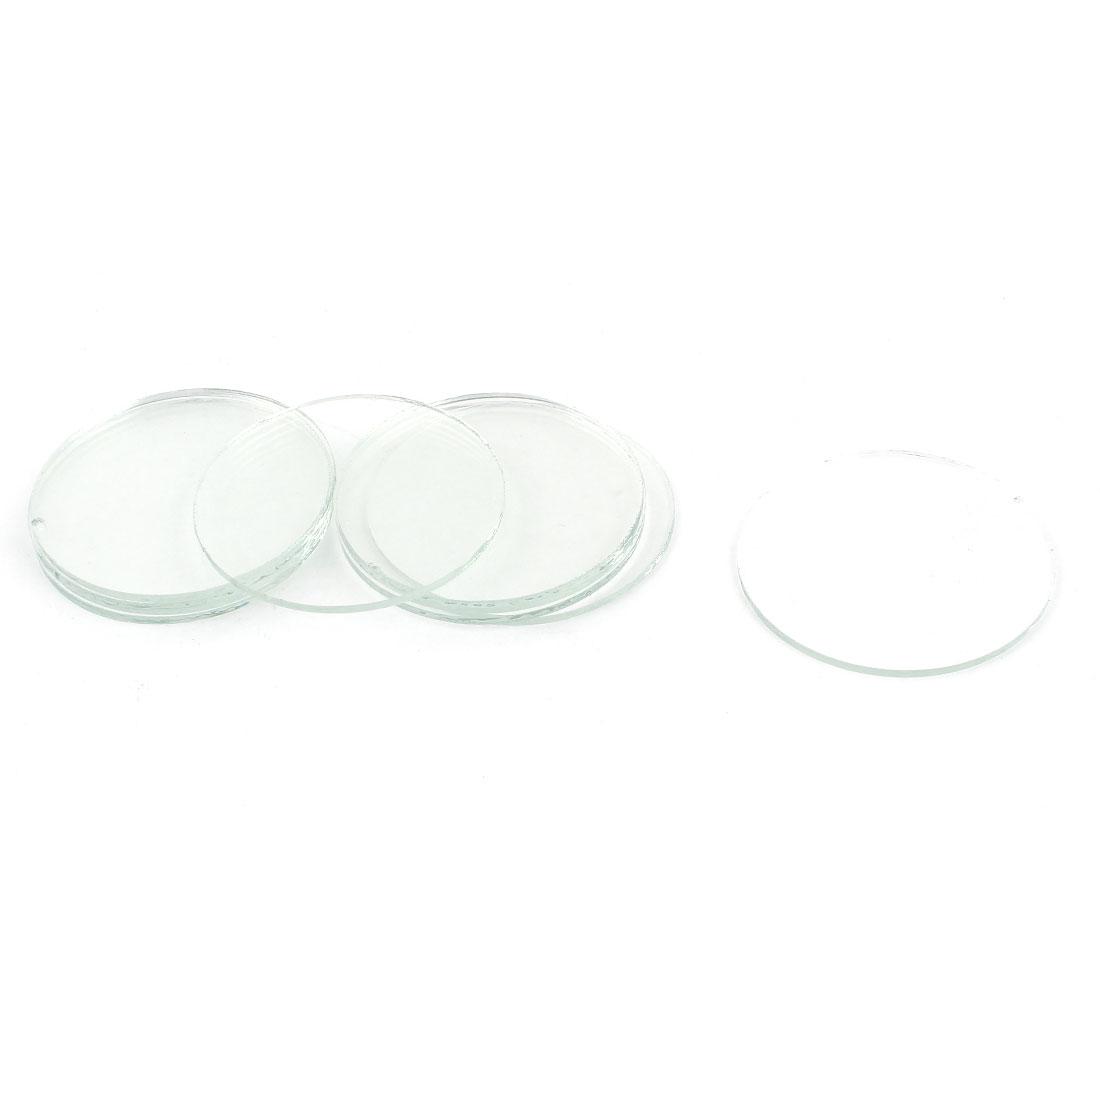 C8 LED Flashlight Torch Clear Round Flat Glass Lens 42mm Diameter 10 Pcs